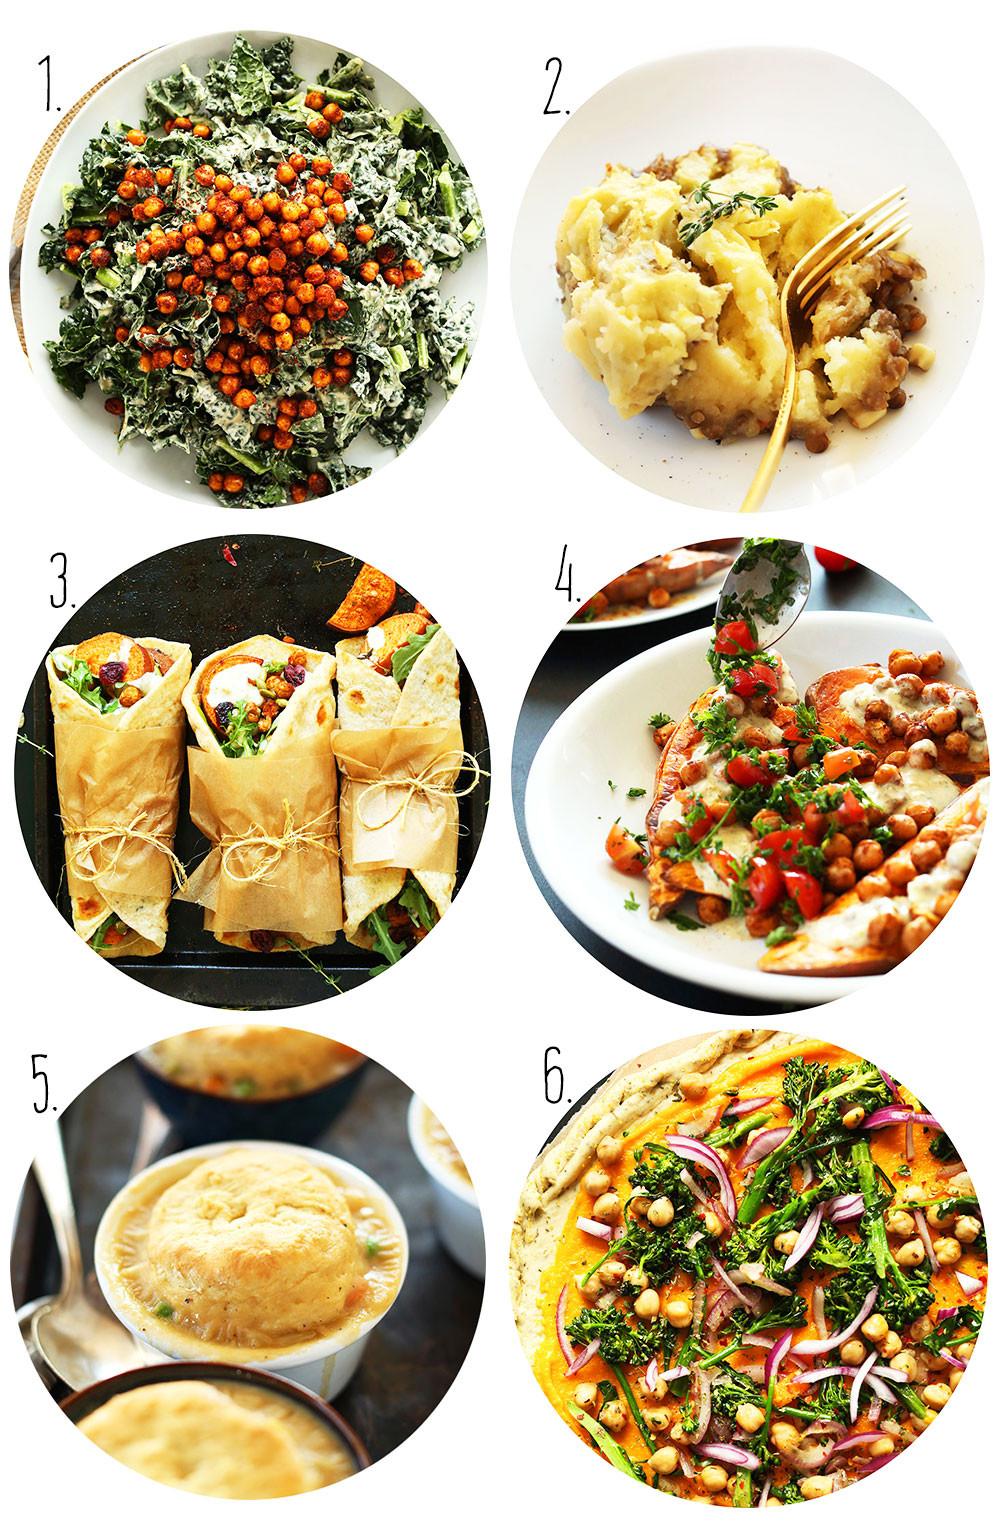 Vegan Turkey For Thanksgiving  Vegan Thanksgiving Recipes